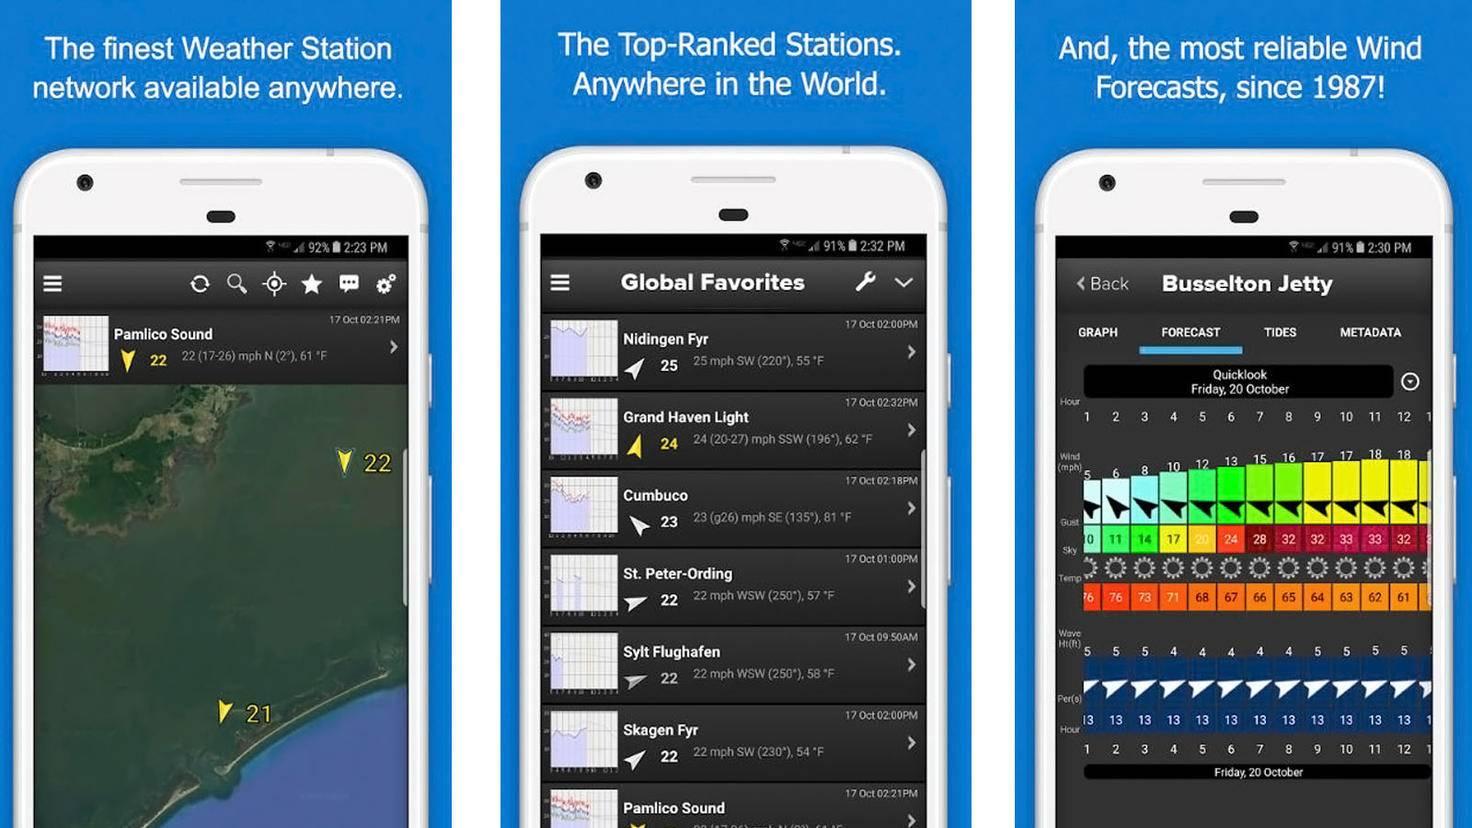 iWindsurf-Google Play Store-WeatherFlow